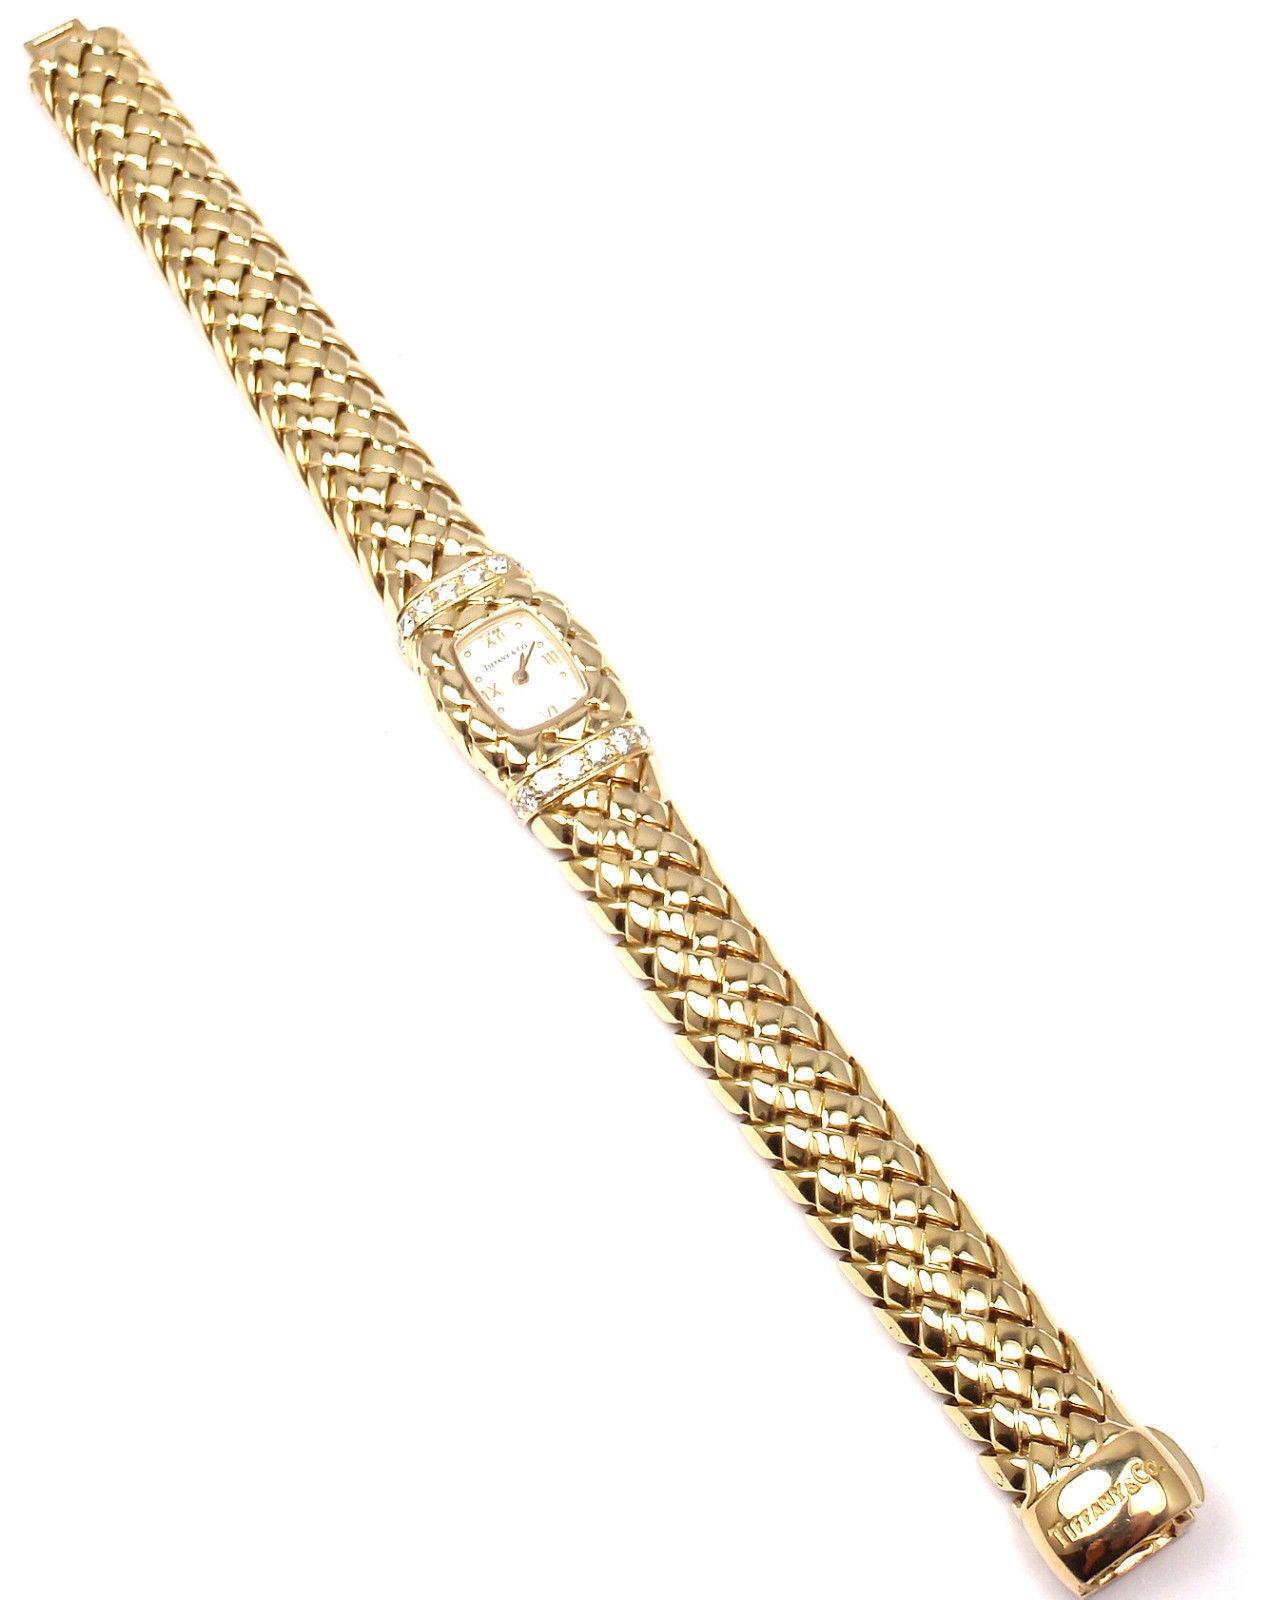 Tiffany & Co. Lady's Yellow Gold Diamond Basket Weave Quartz Wristwatch 4